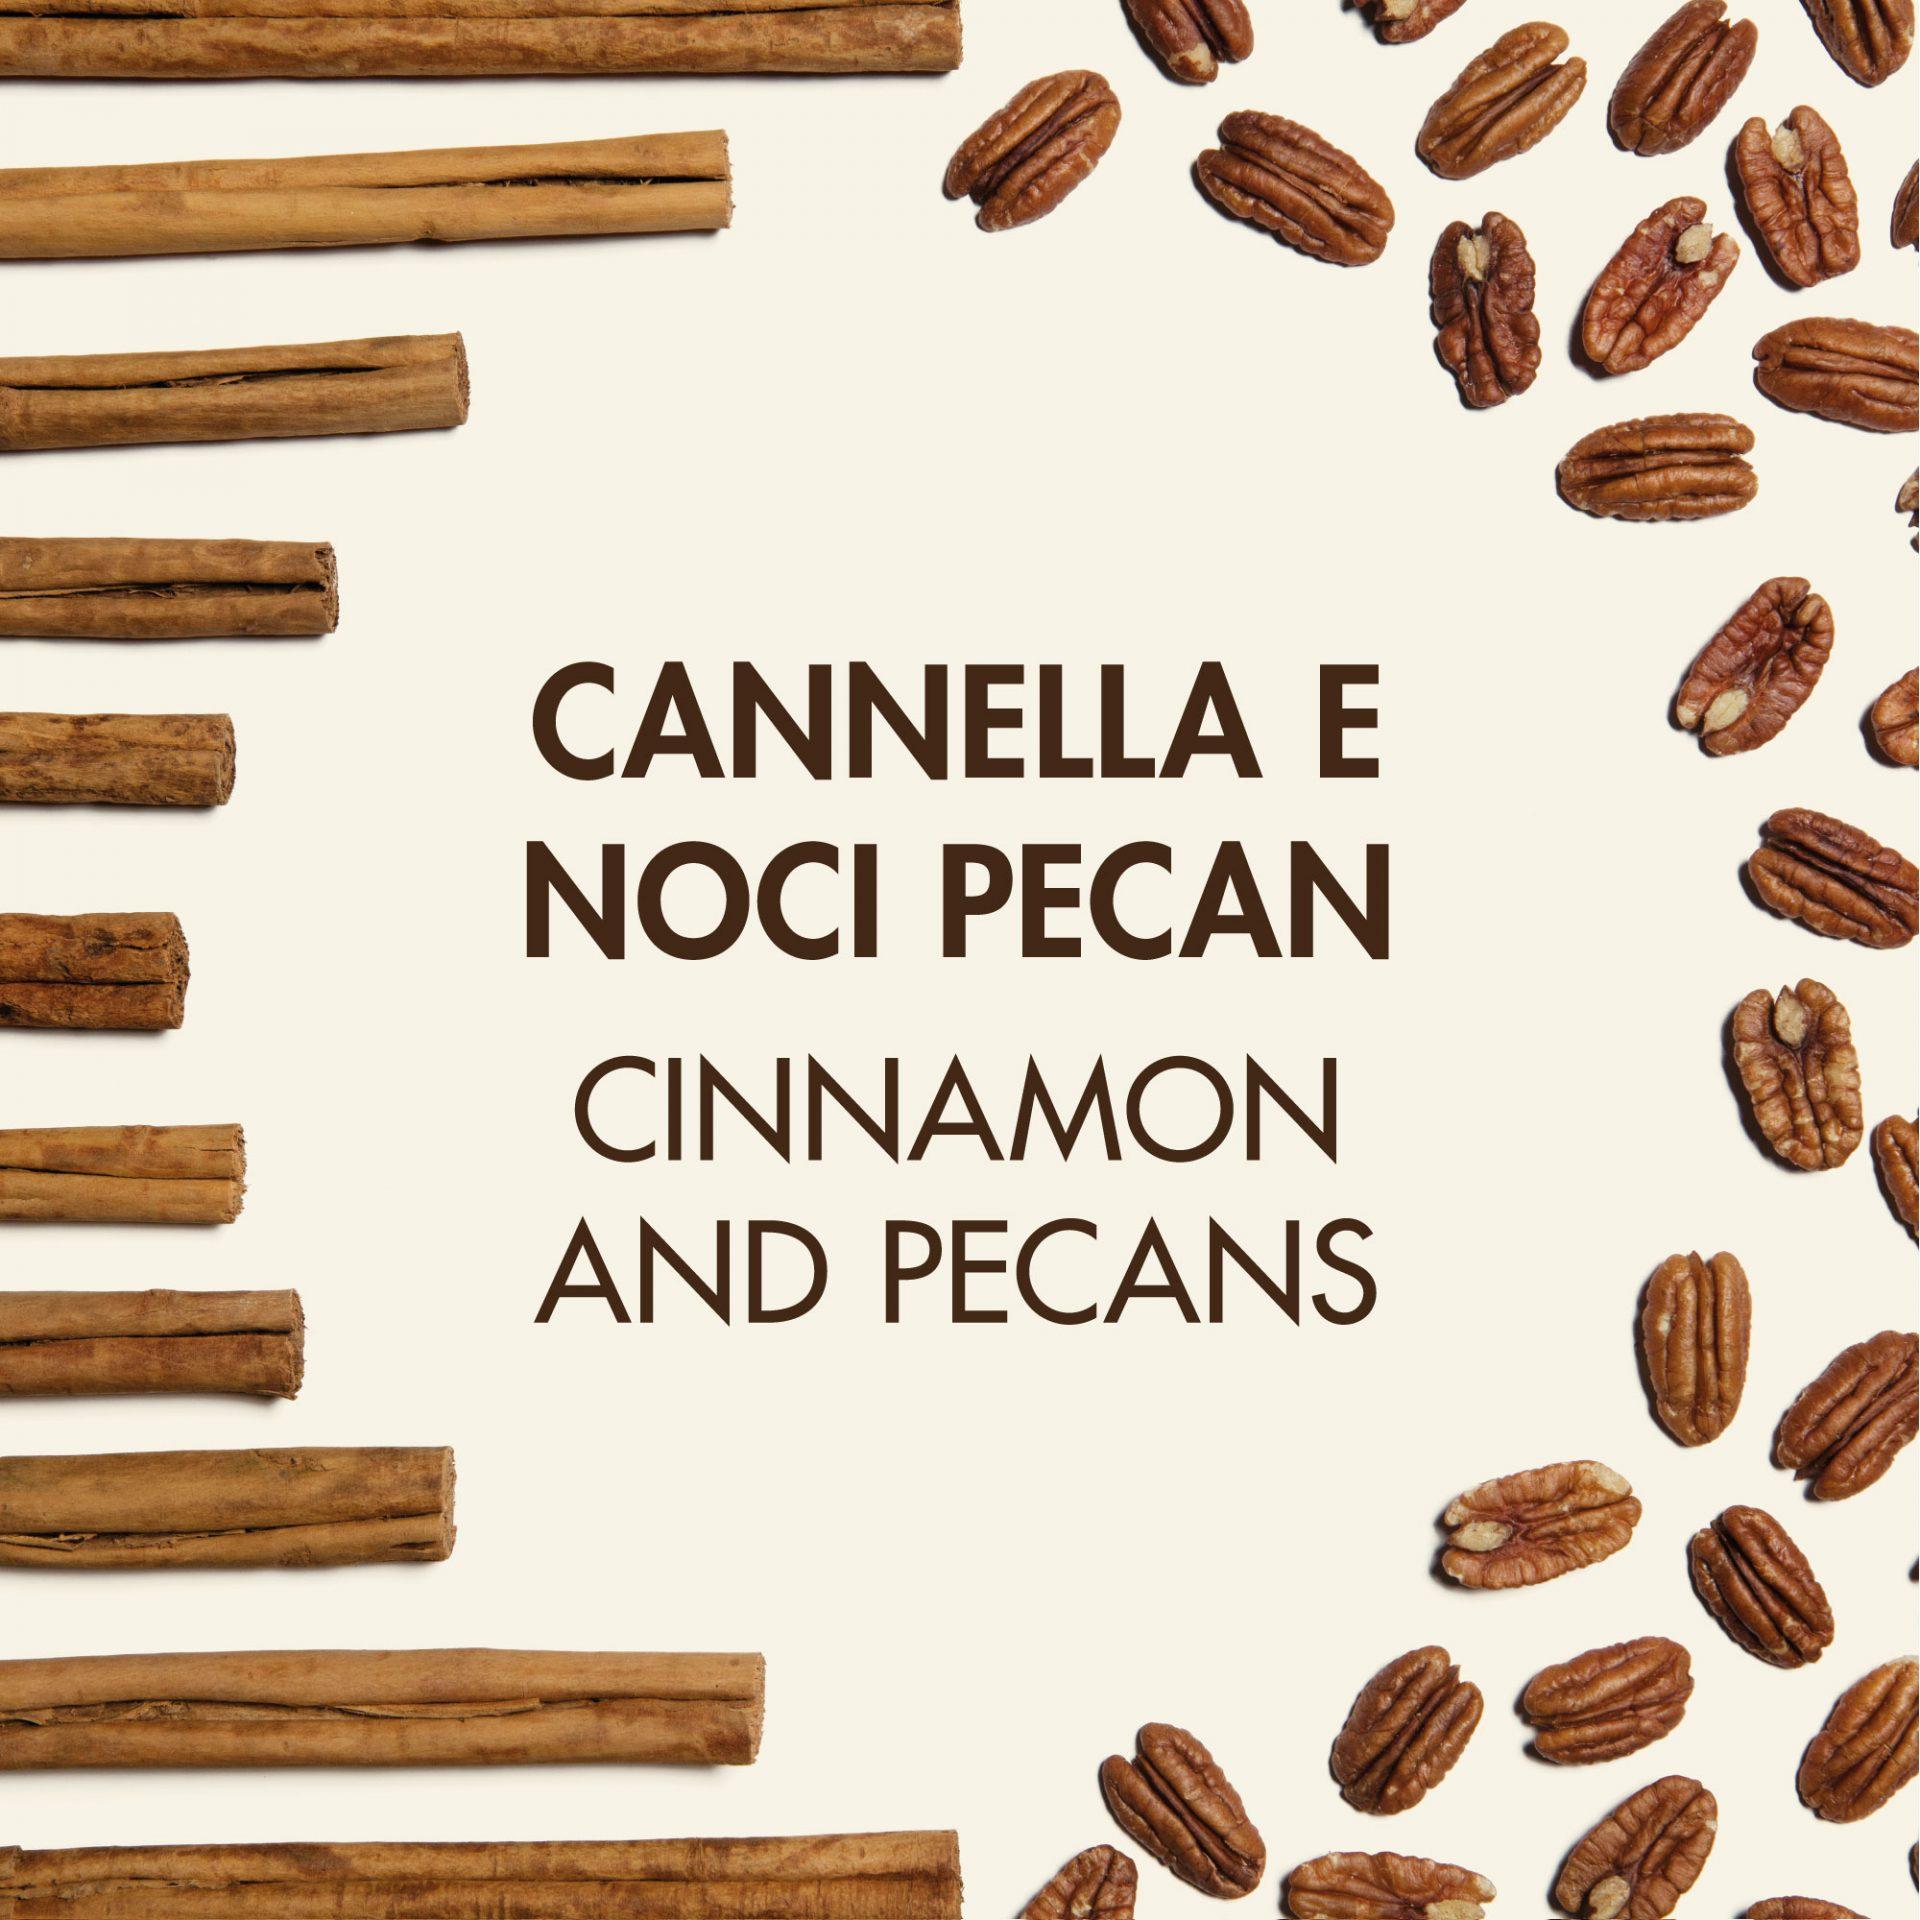 180419_Esecutivi_gusti_scala-1-1_Cannella-noci-pecan_ITAENG